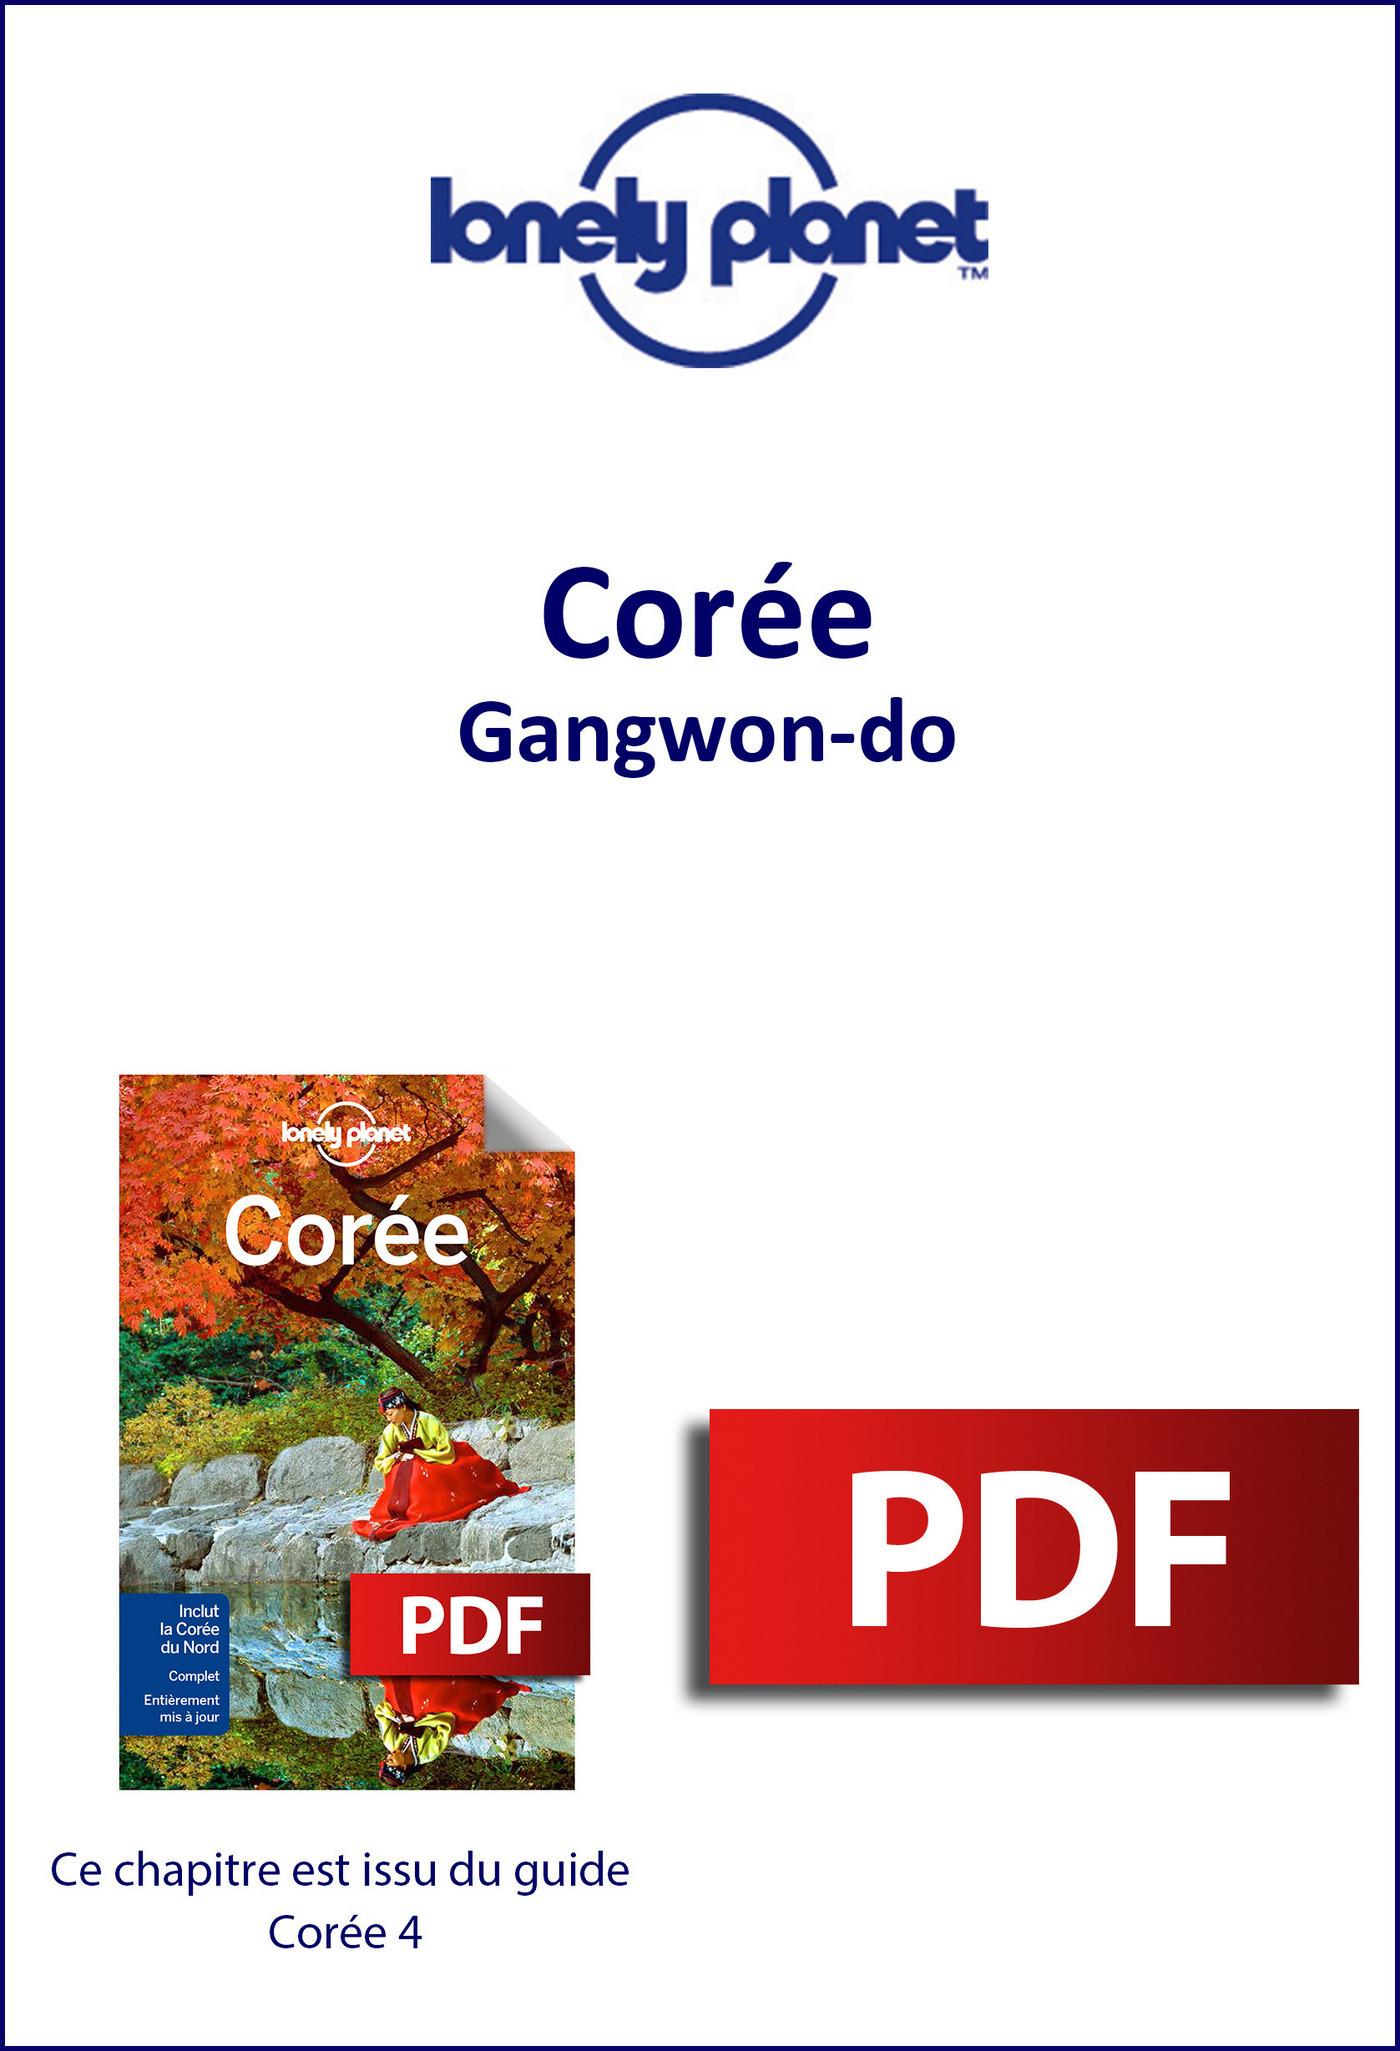 Corée - Gangwon-do